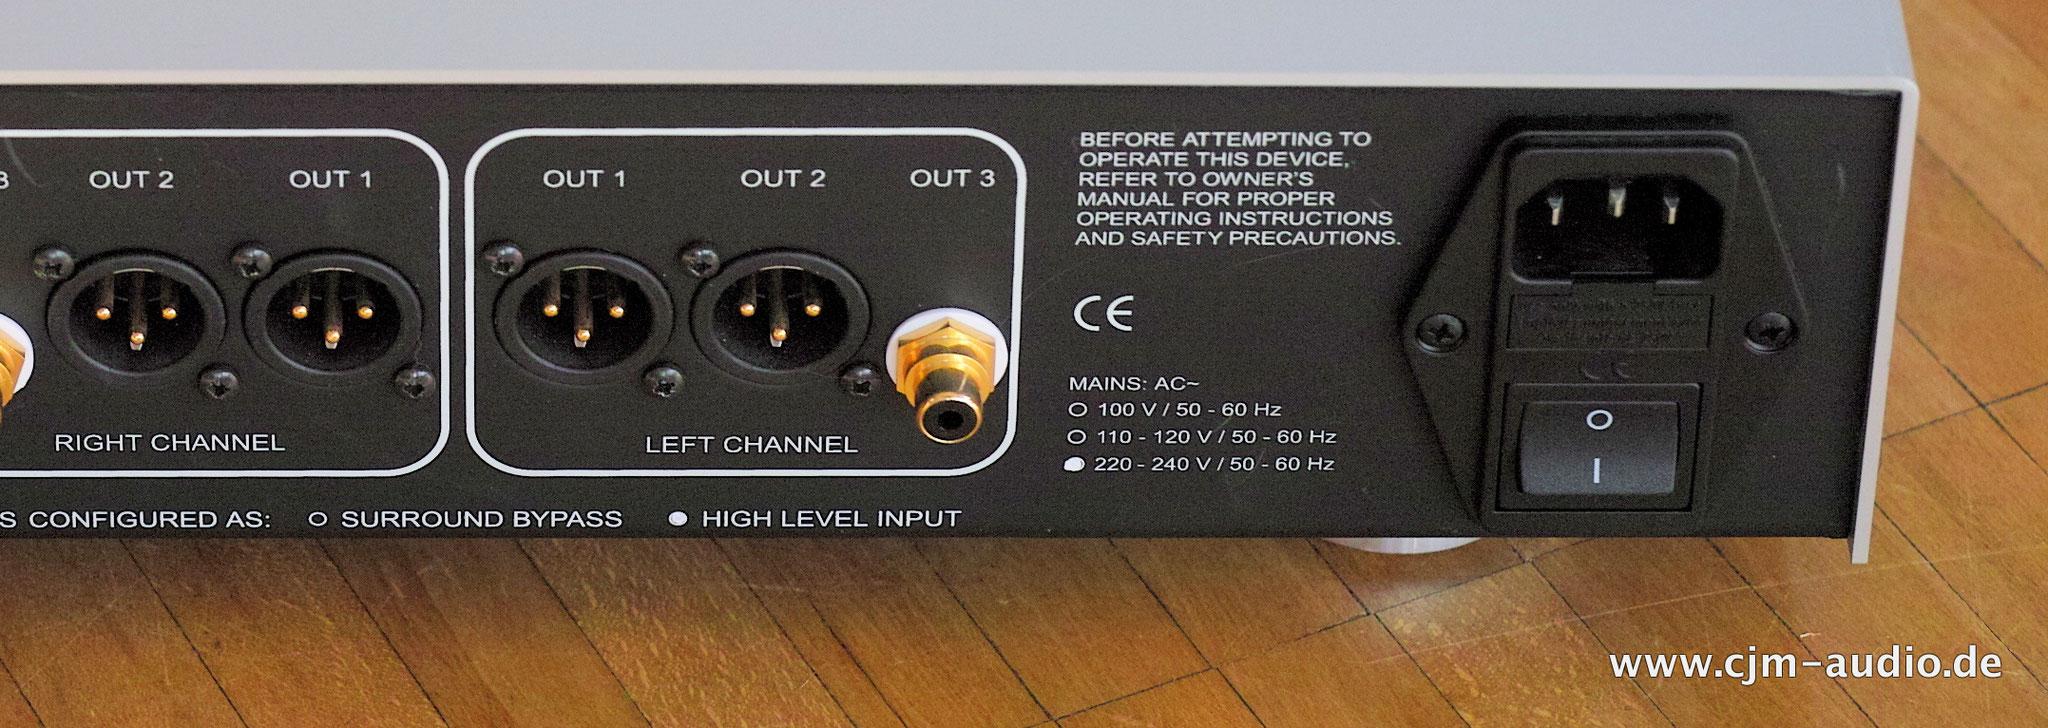 Accustic Arts Preamp 1 Balanced Mkii Cjm Audio High End Audiomarkt Preamplifier